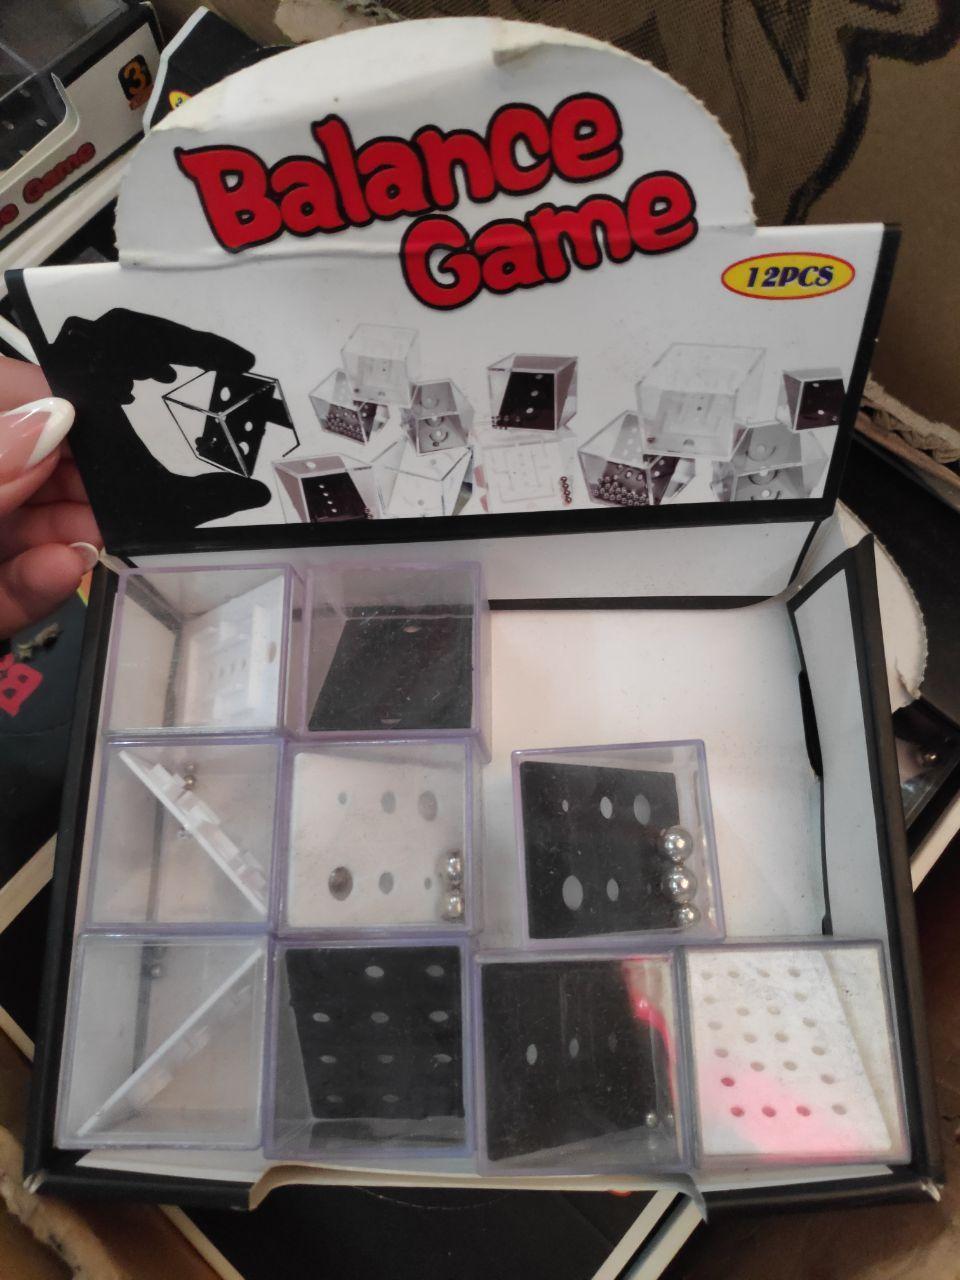 Balance game 12 штук  X13269